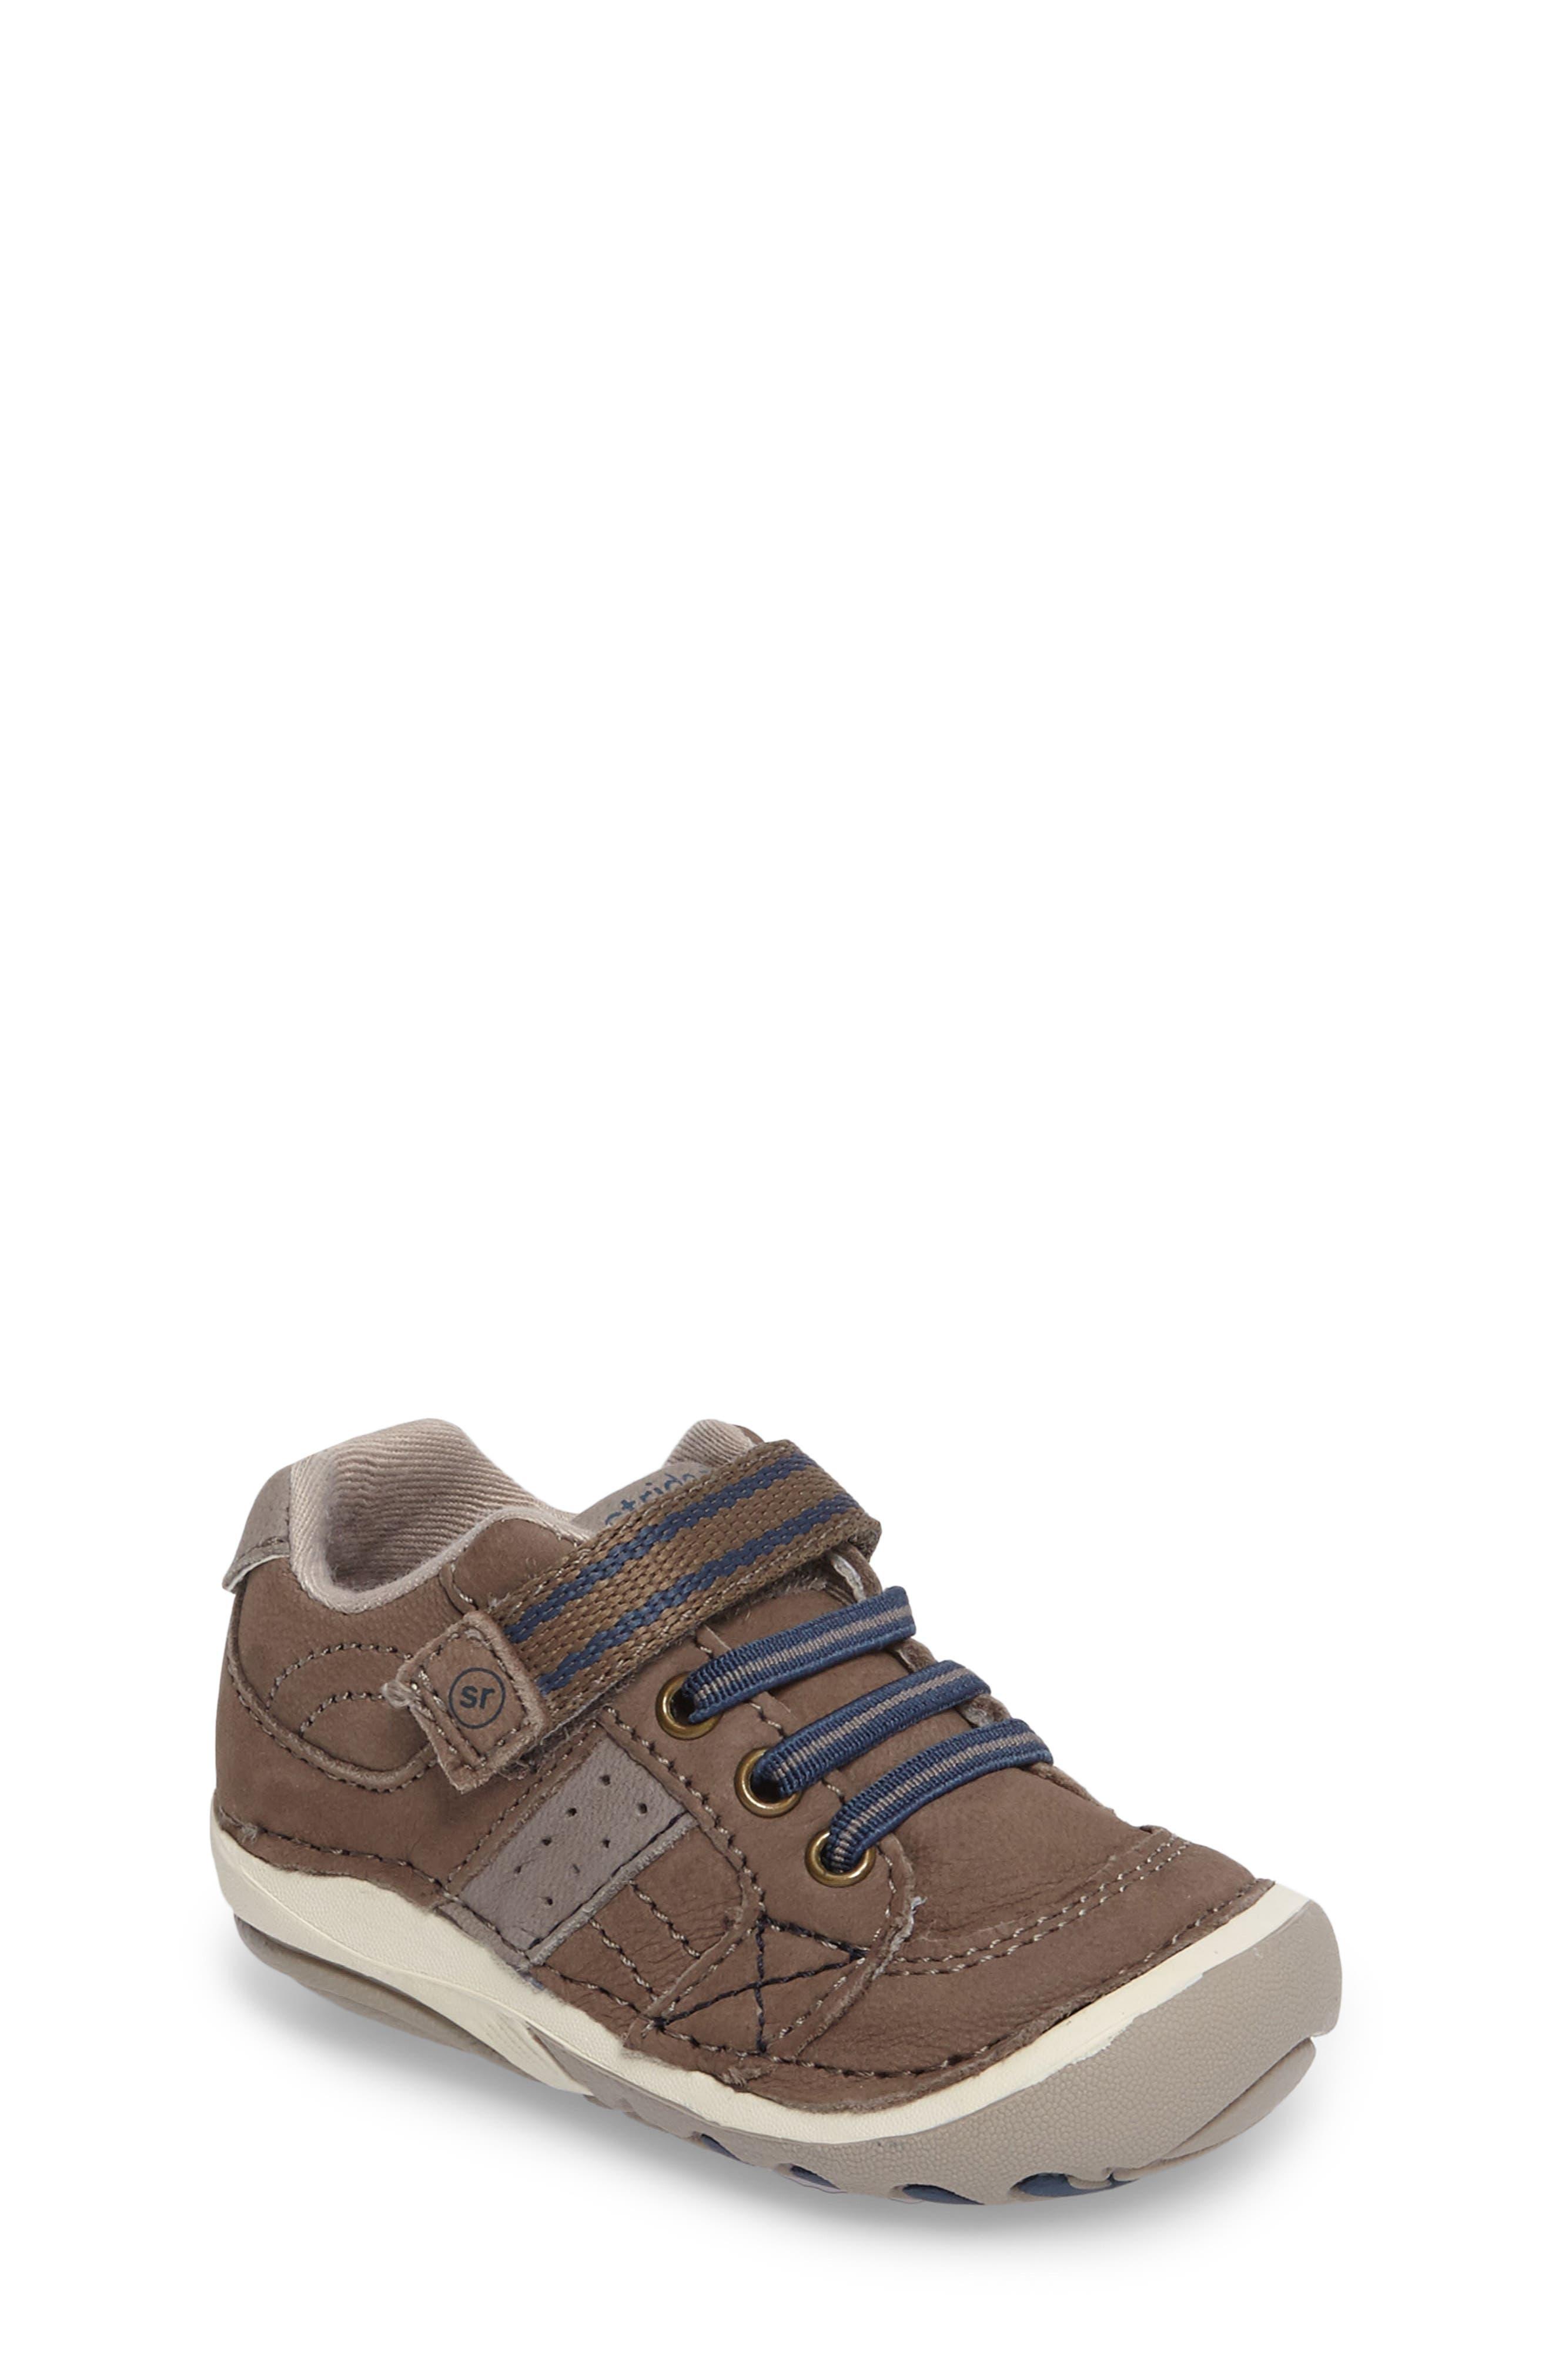 'Artie' Sneaker,                             Main thumbnail 1, color,                             TRUFFLE